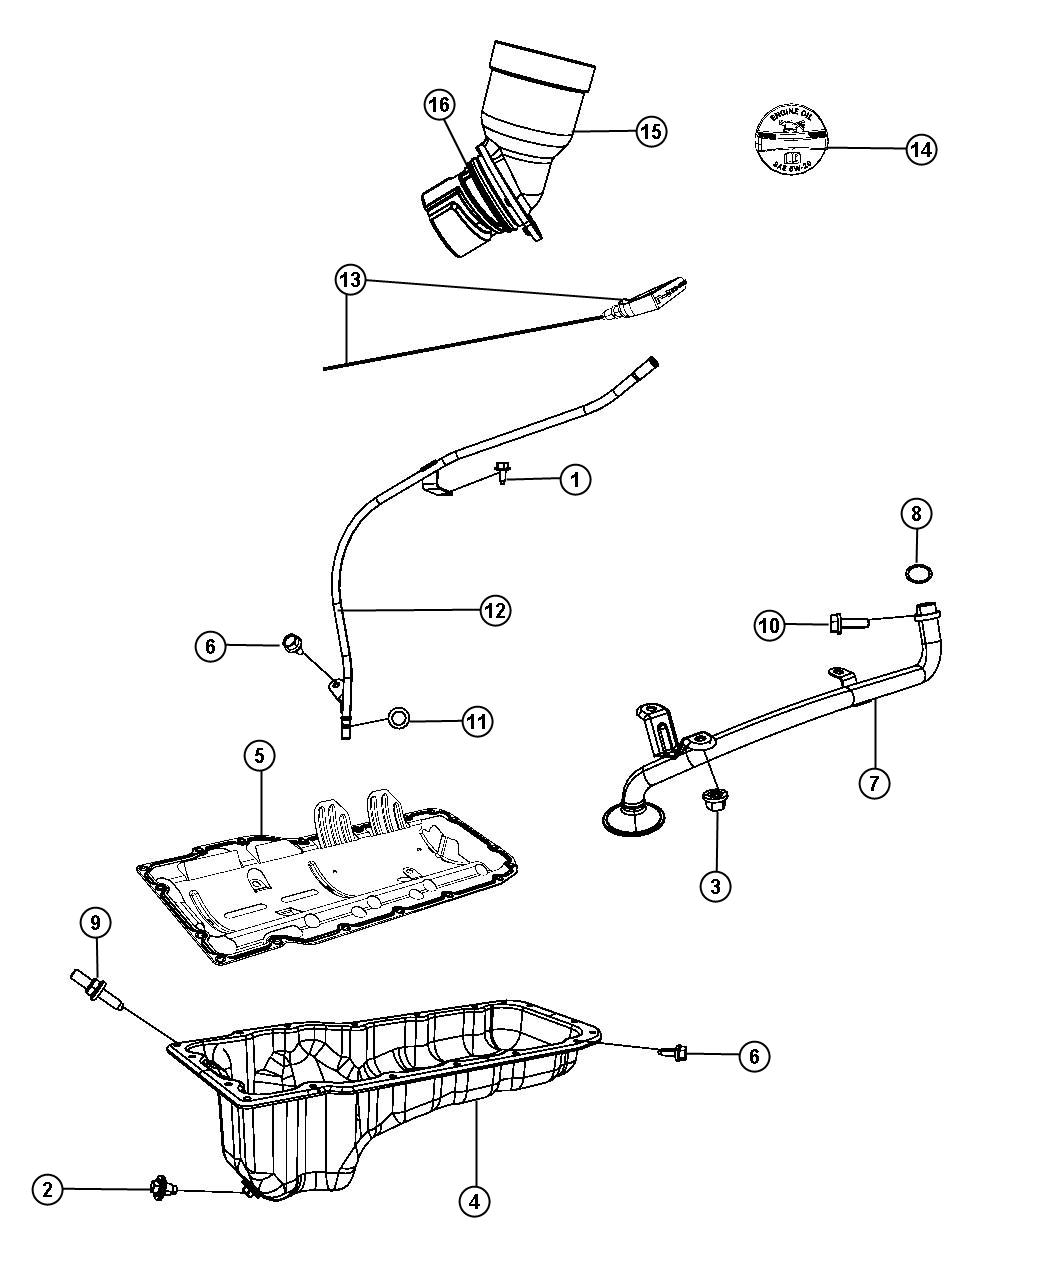 jeep grand cherokee engine parts diagram